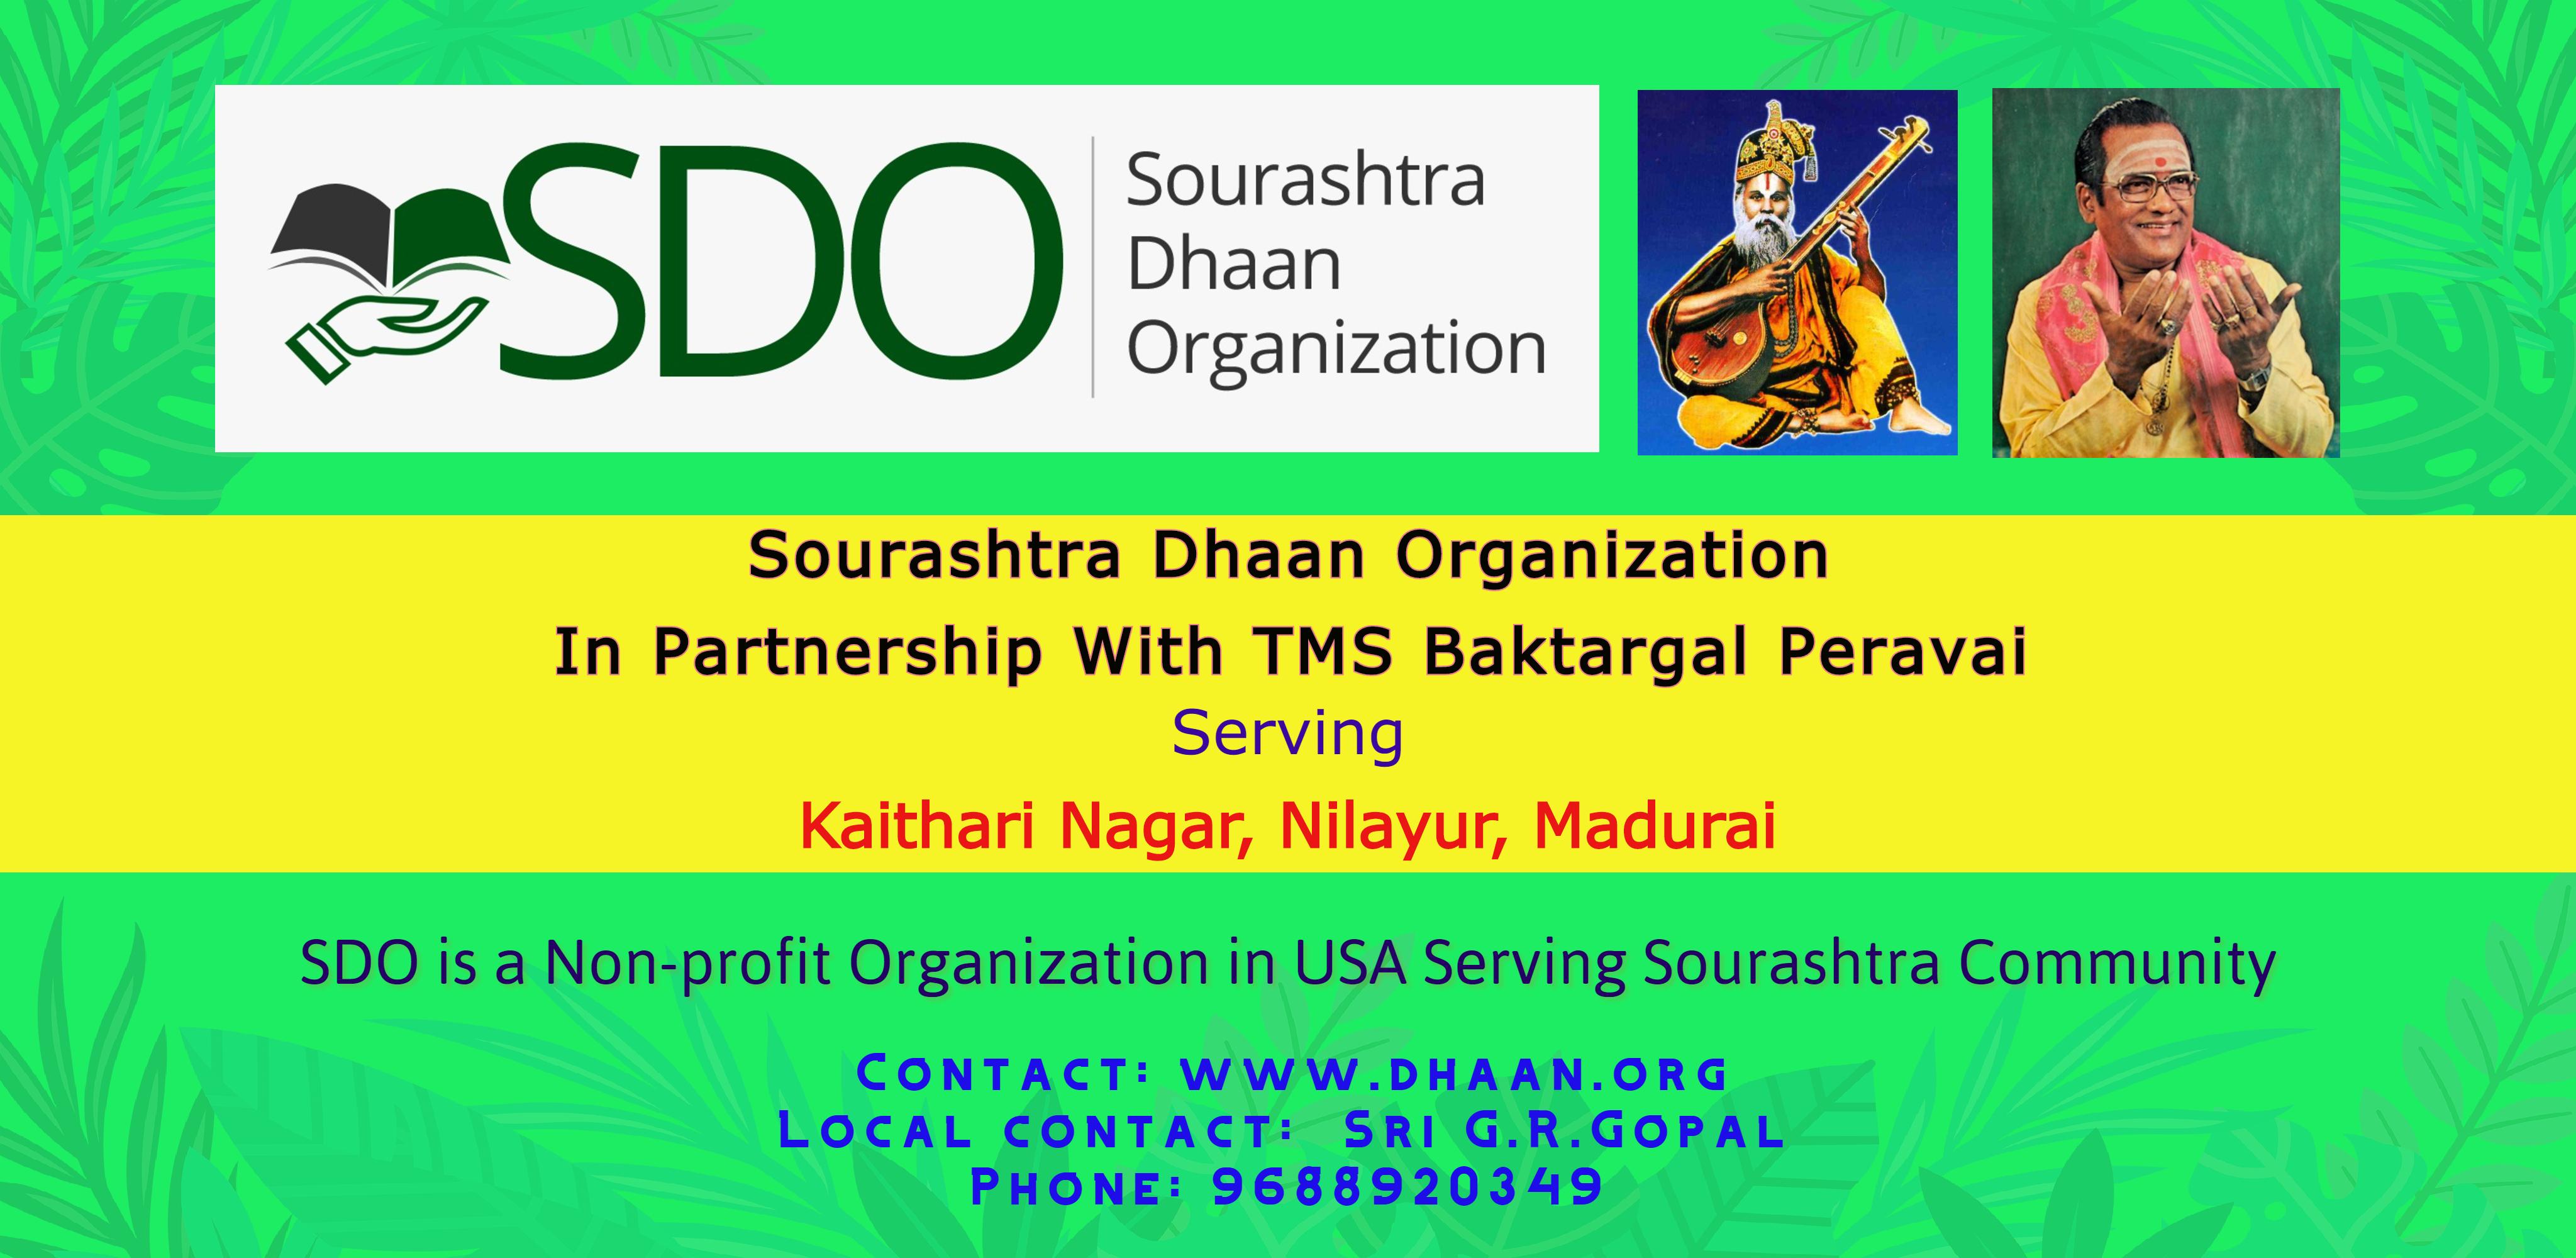 Dhaan TMS Baktargal Peravai.jpg